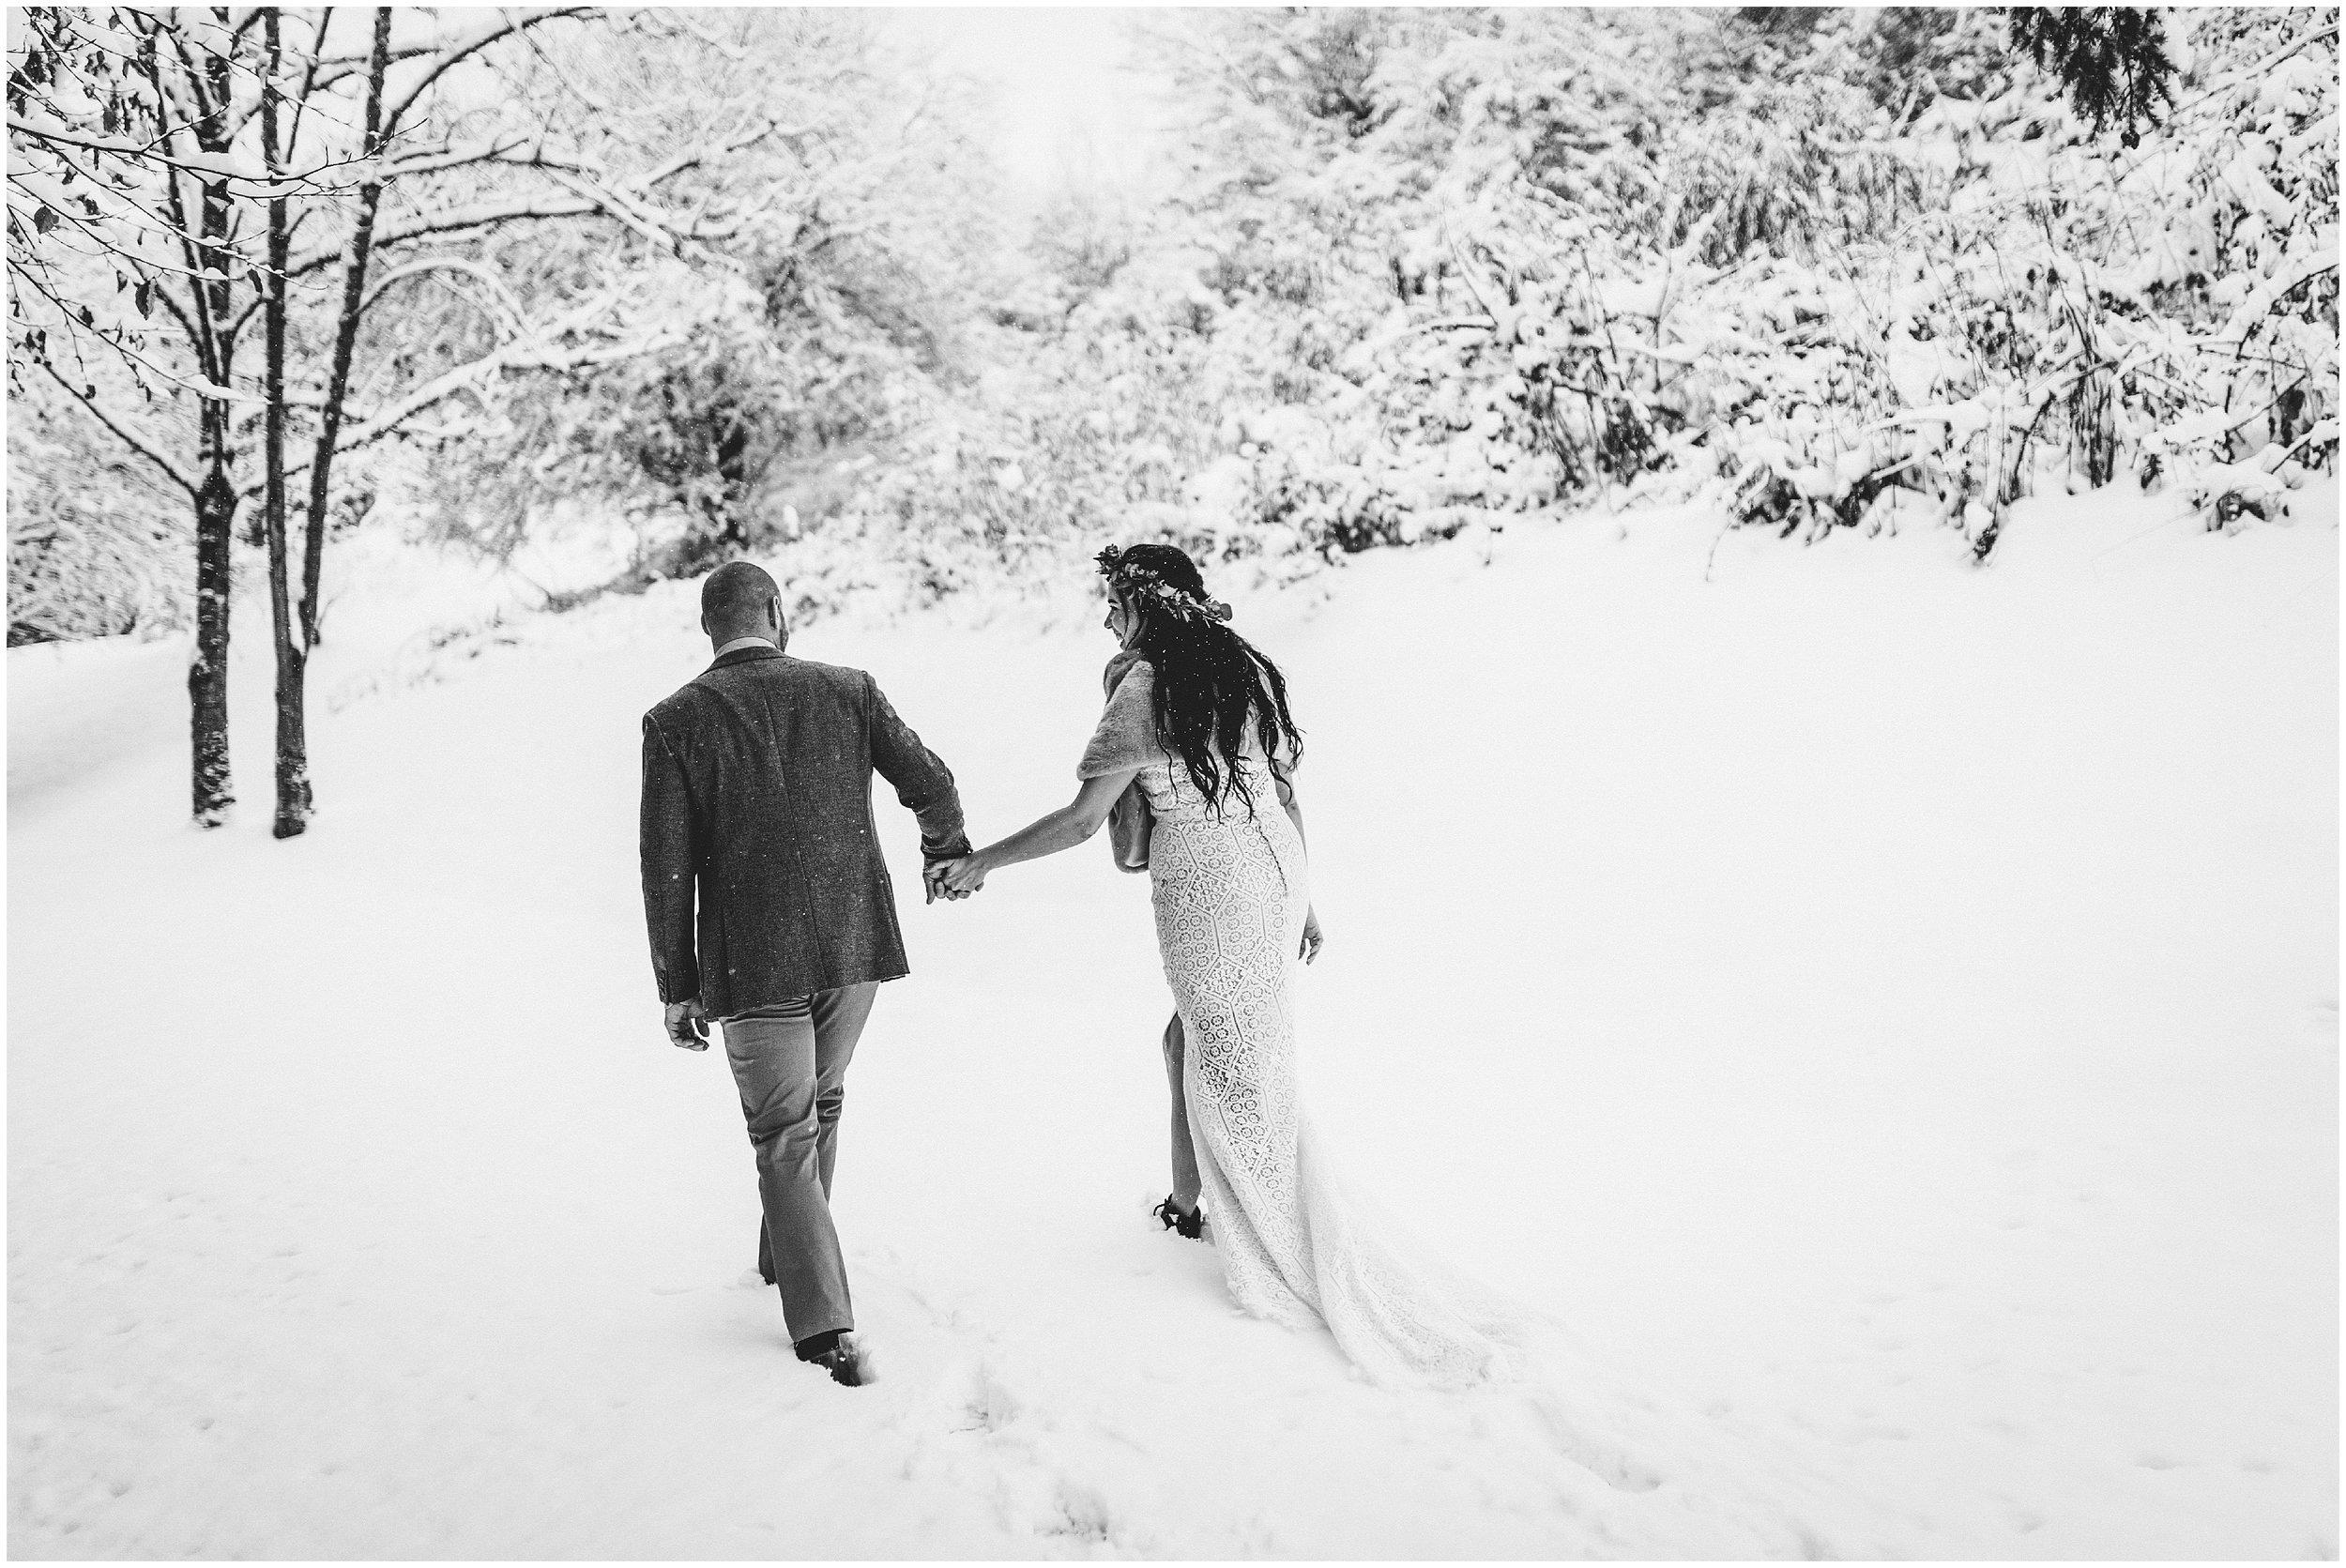 huwelijksfotografie-jana-joeri-ardennen-sechery_0021.jpg